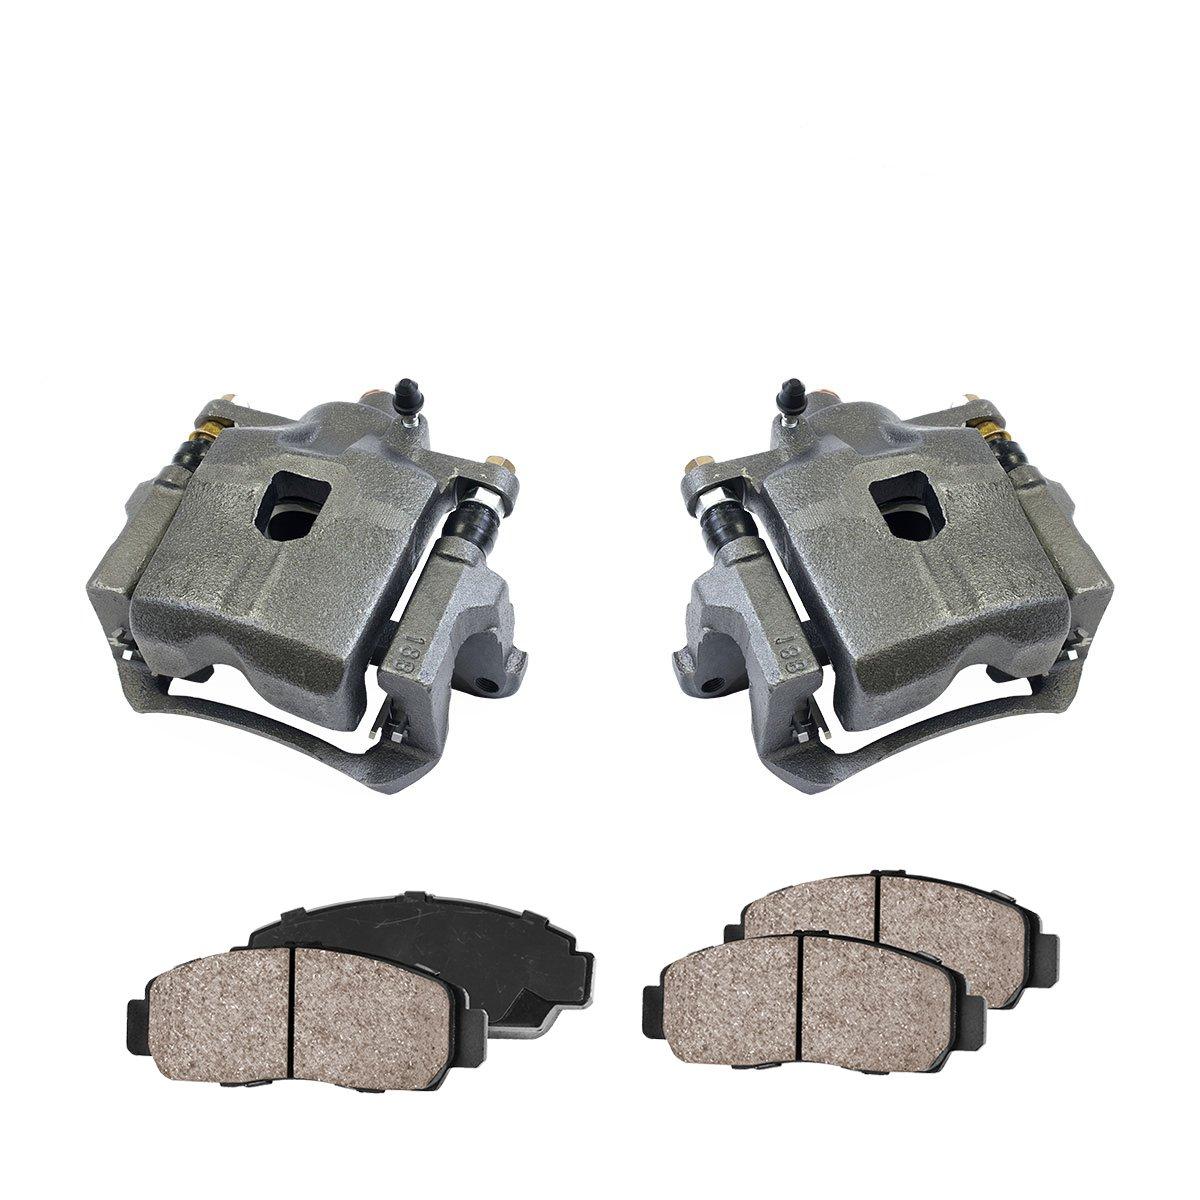 CCK02755 2 4 Quiet Low Dust Ceramic Brake Pads FRONT Premium Loaded OE Caliper Assembly Set +